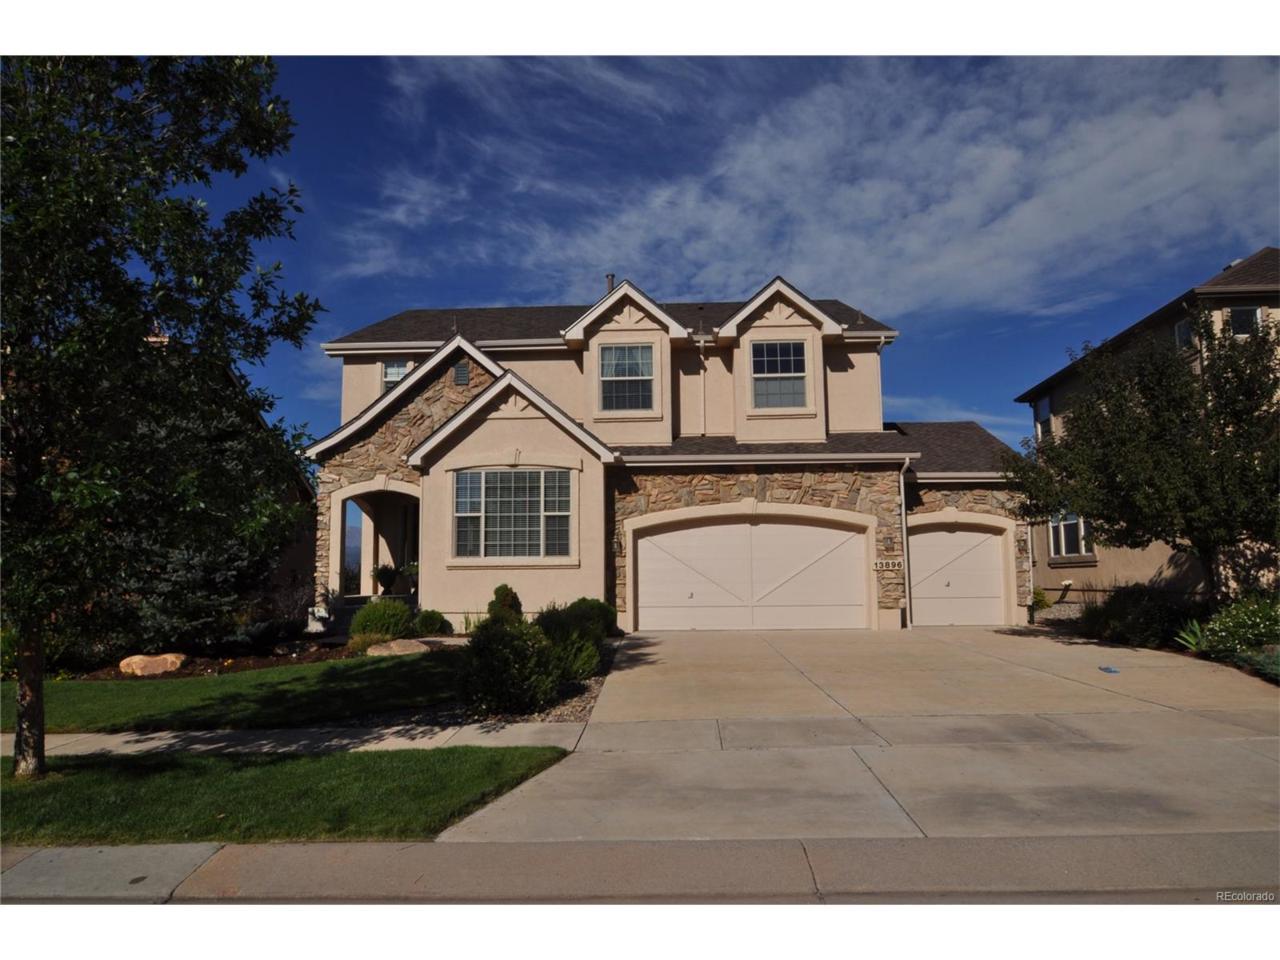 13896 Windy Oaks Road, Colorado Springs, CO 80921 (MLS #2024131) :: 8z Real Estate